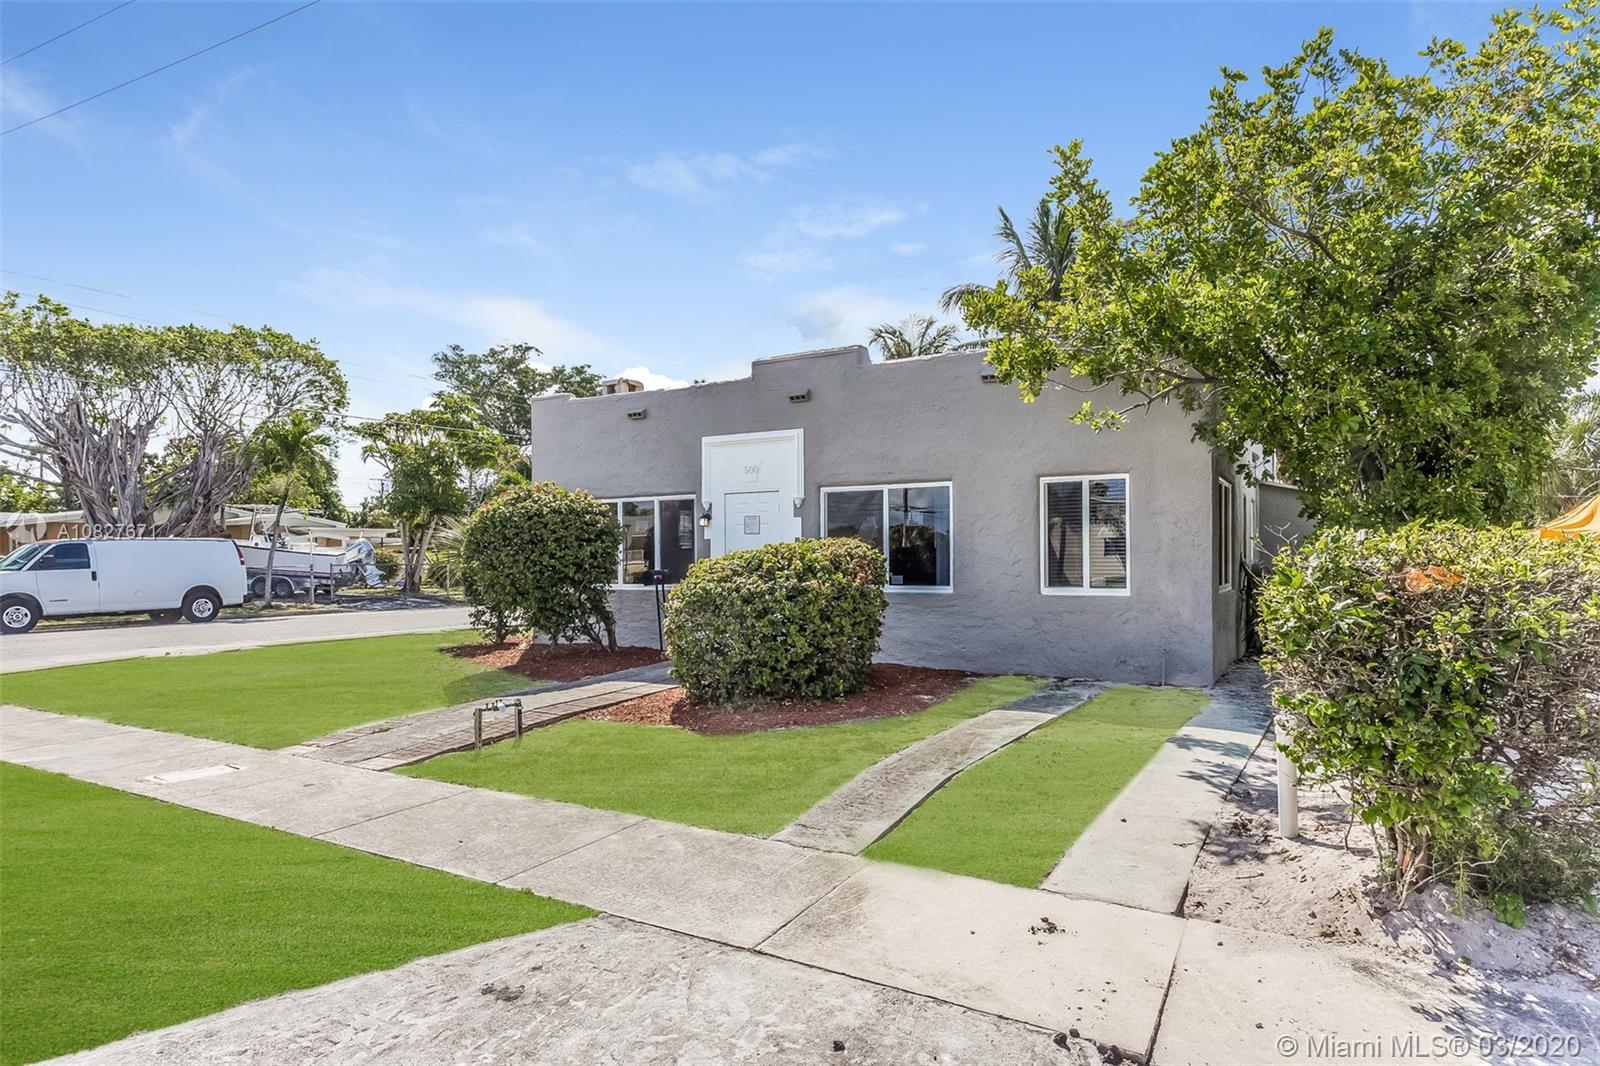 500 Churchill Rd, West Palm Beach, FL 33405 - West Palm Beach, FL real estate listing